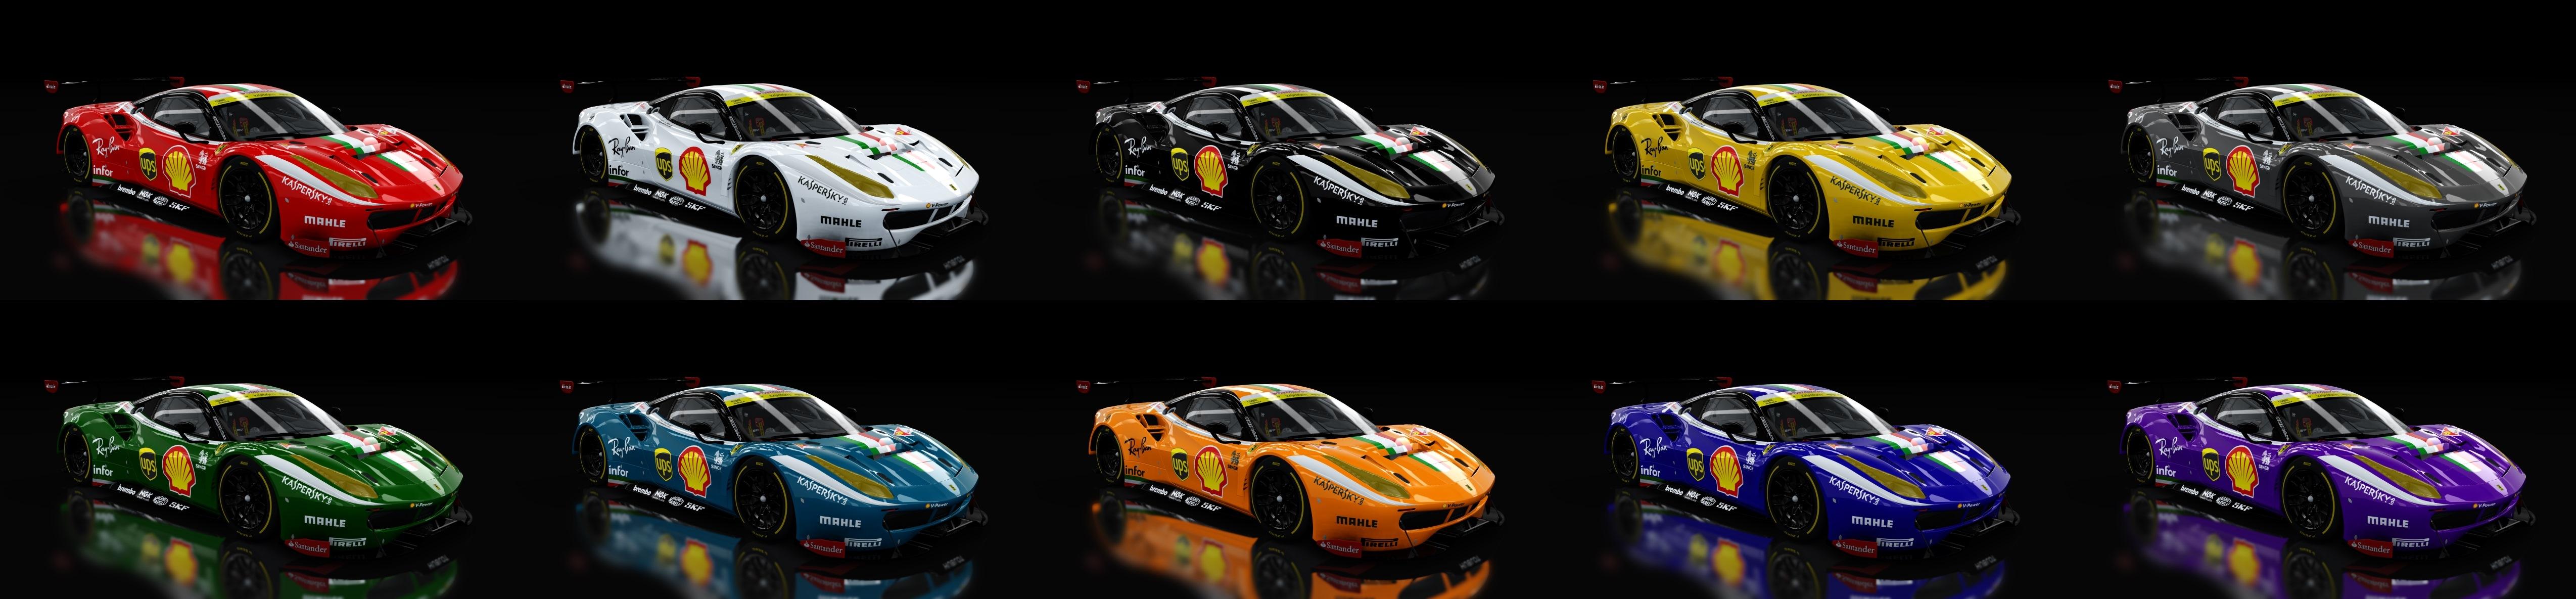 Scuderia_Ferrari_6.jpg